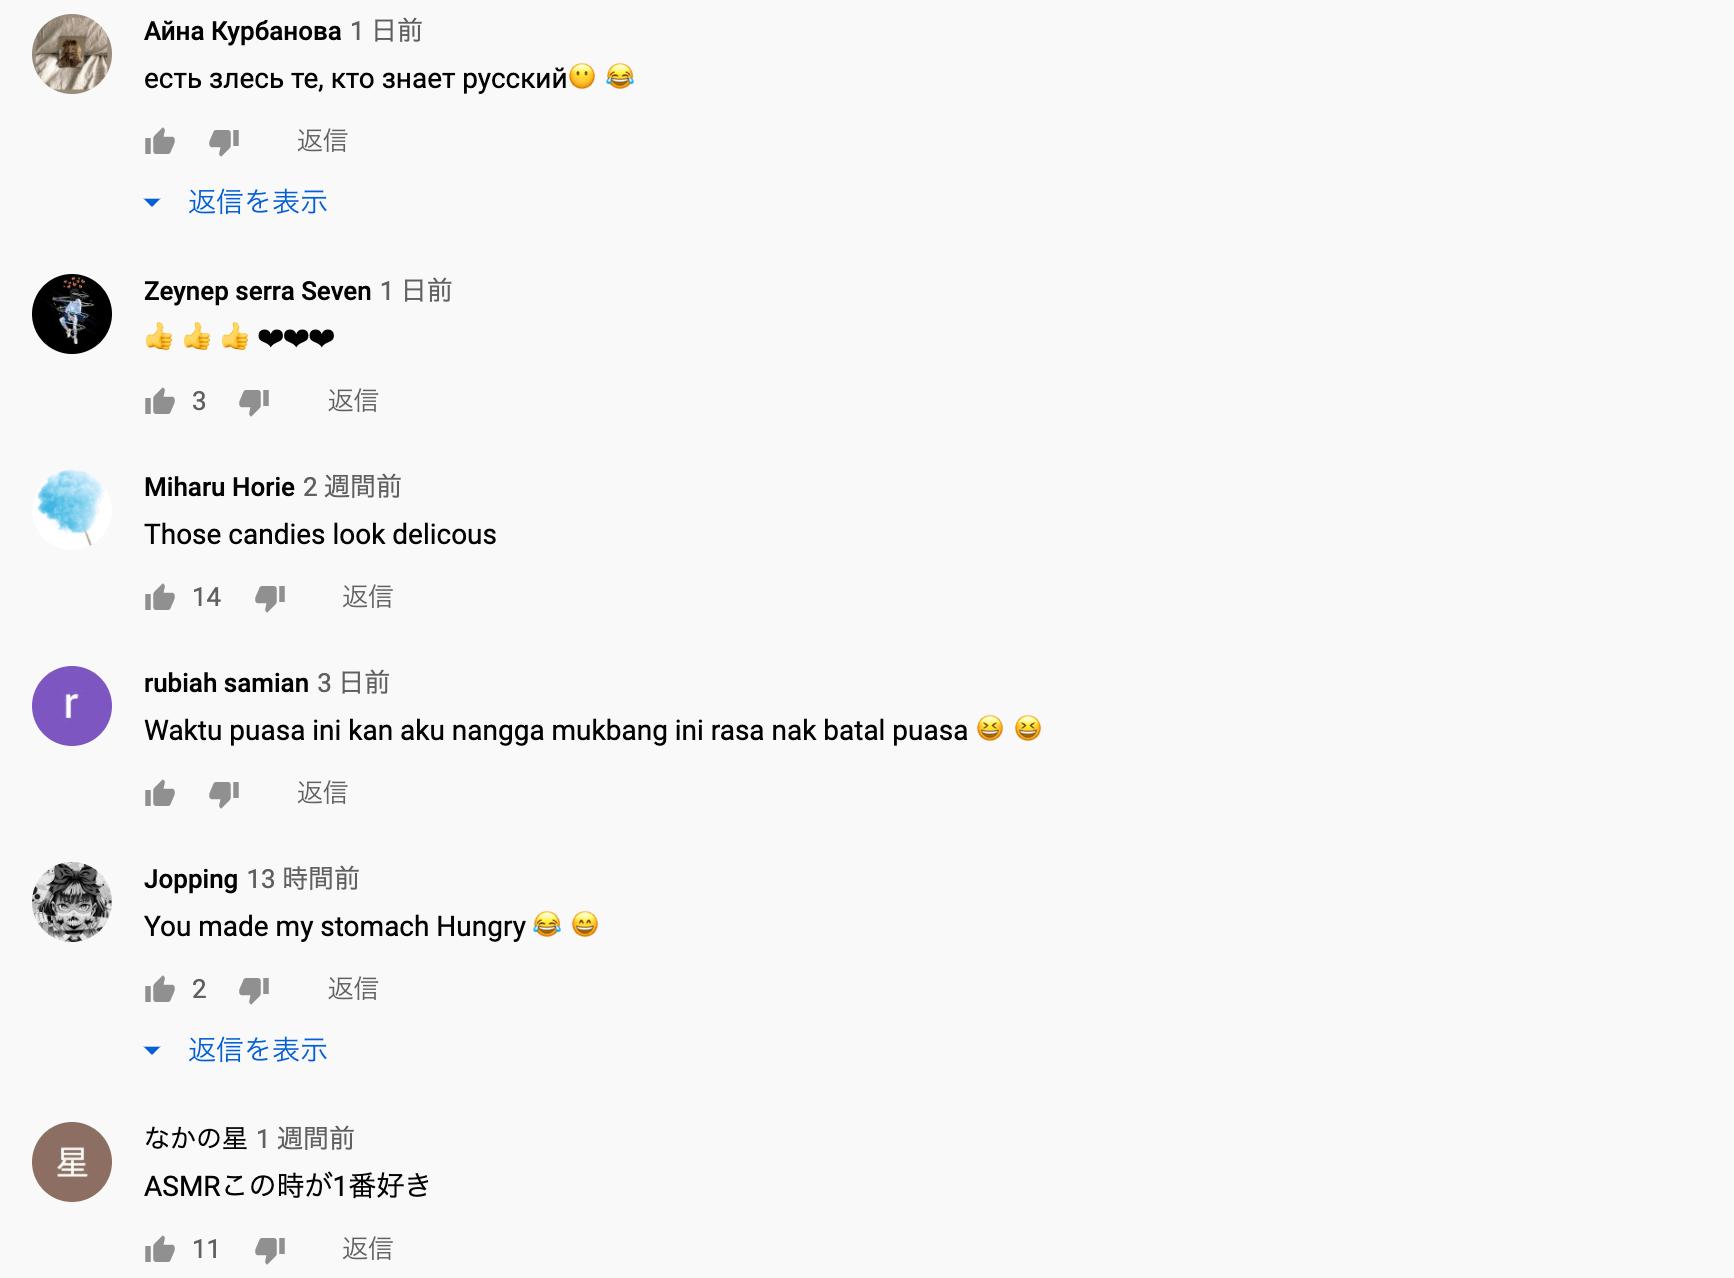 youtube_asmr_popular_comment